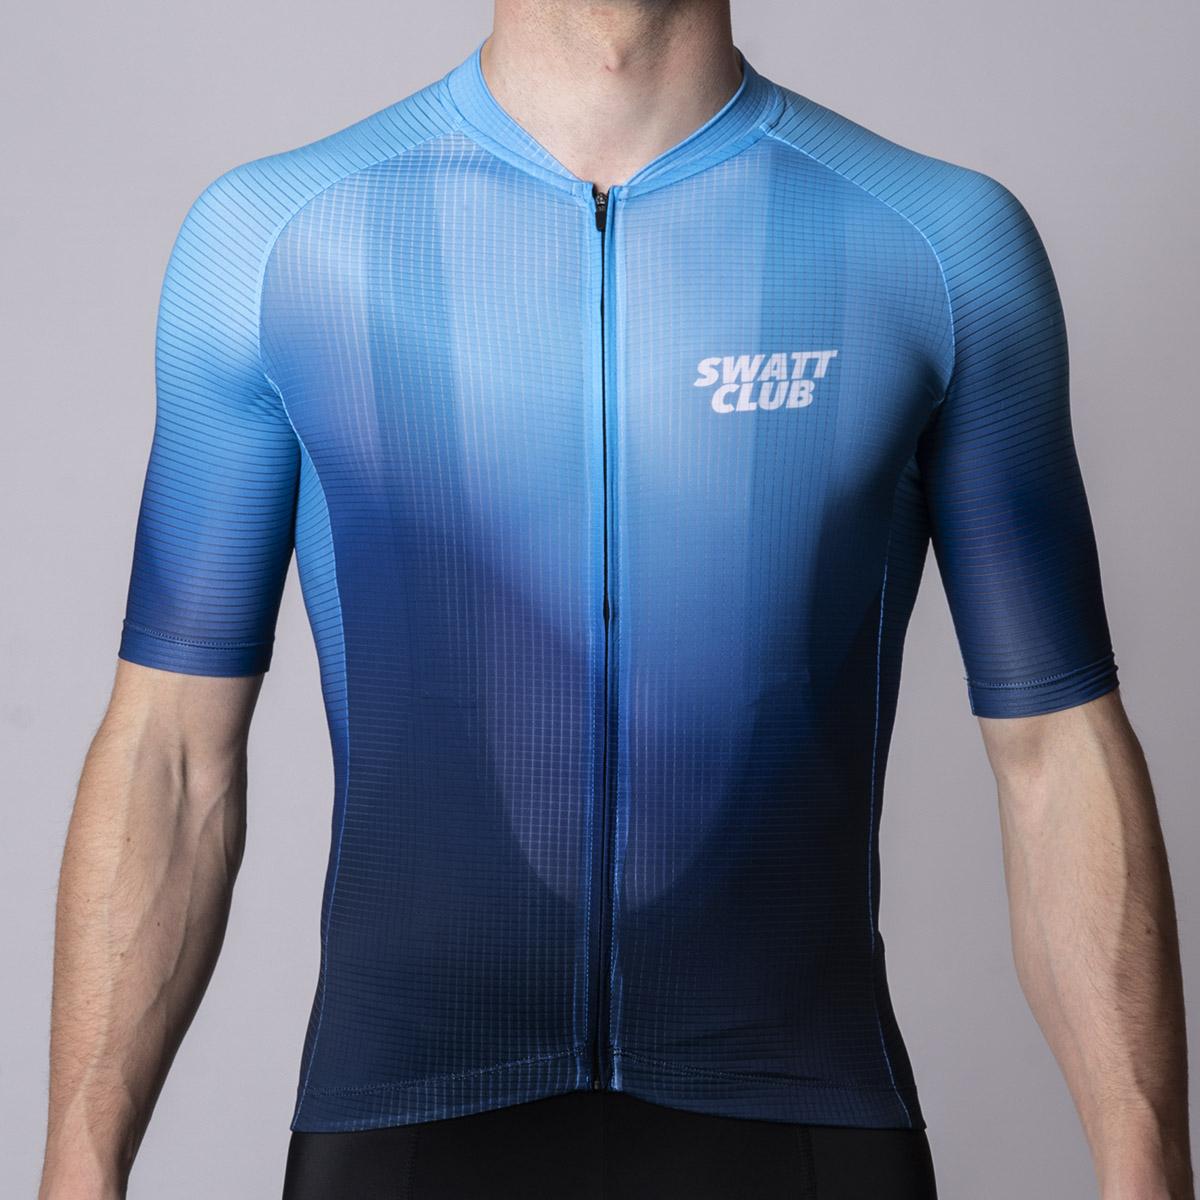 Oceano cycling jersey swatt club maglia ciclismo